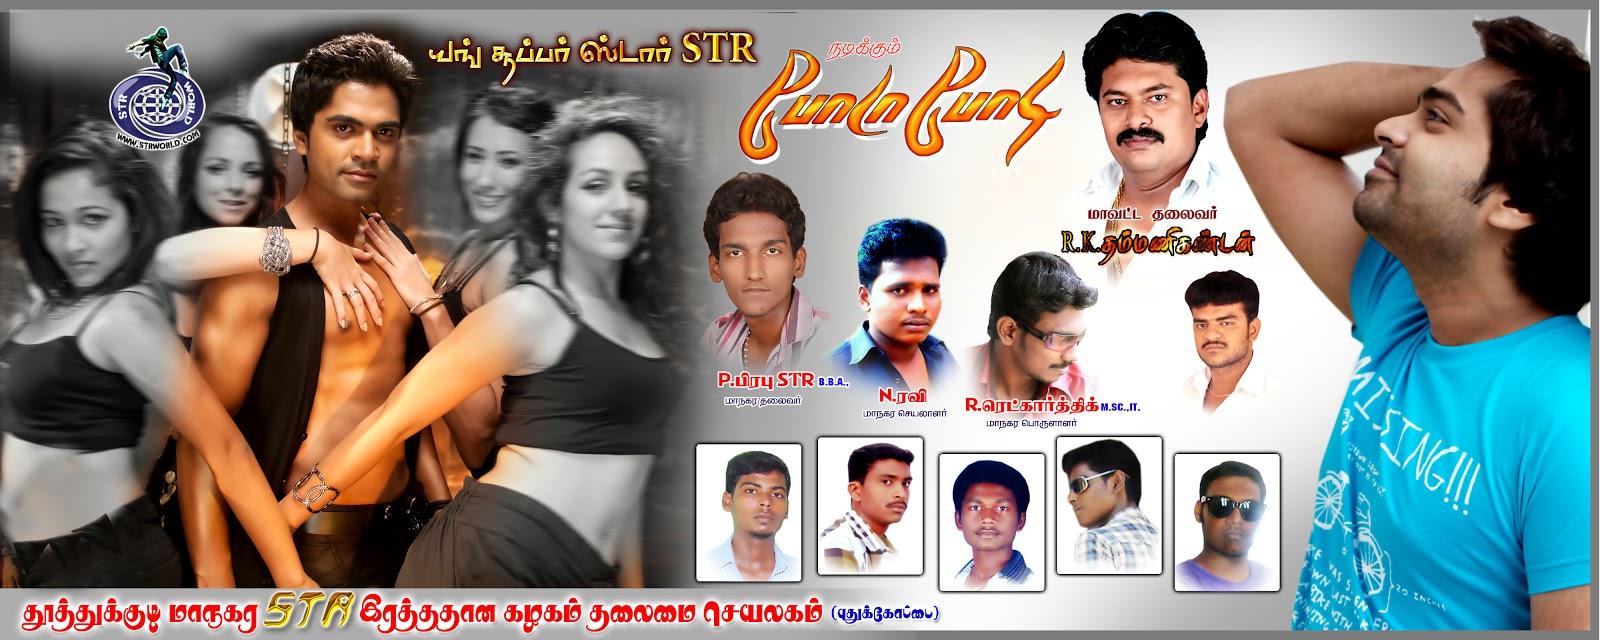 STR Podapodi Movie Banners